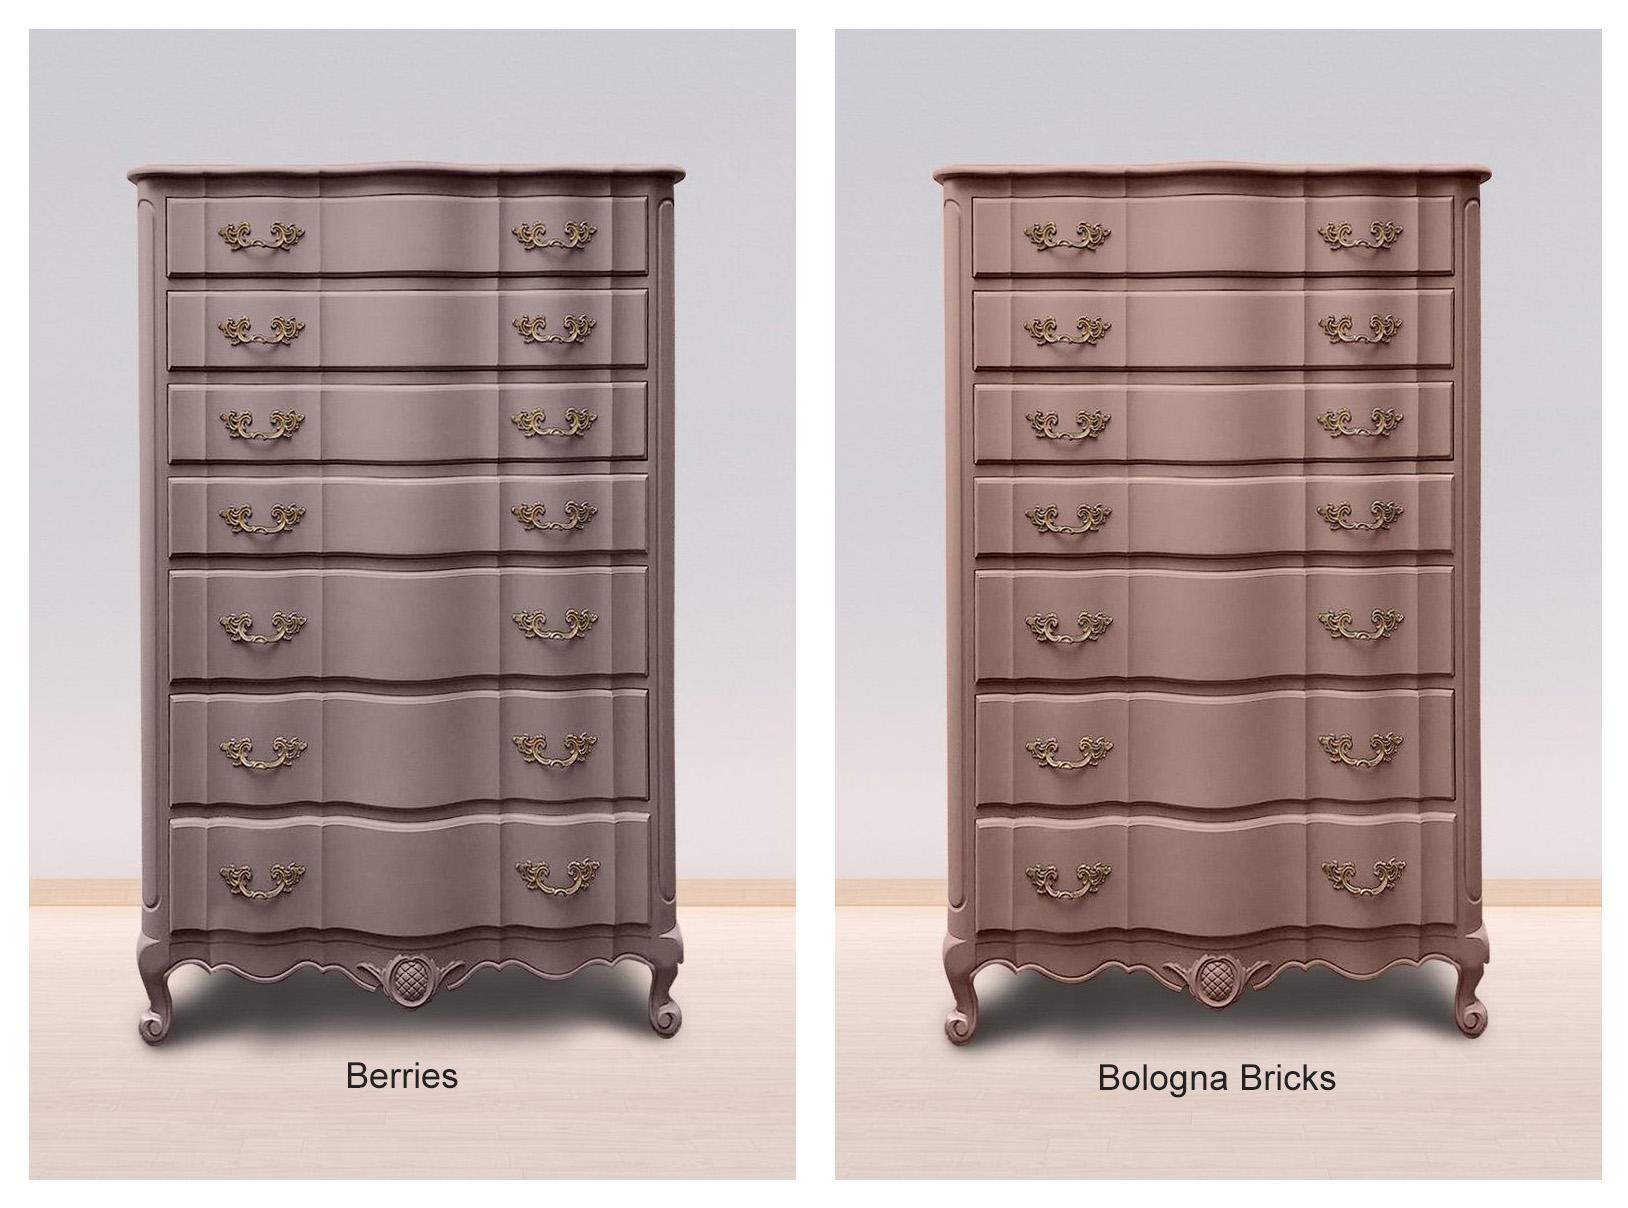 Berries & Bologna Bricks